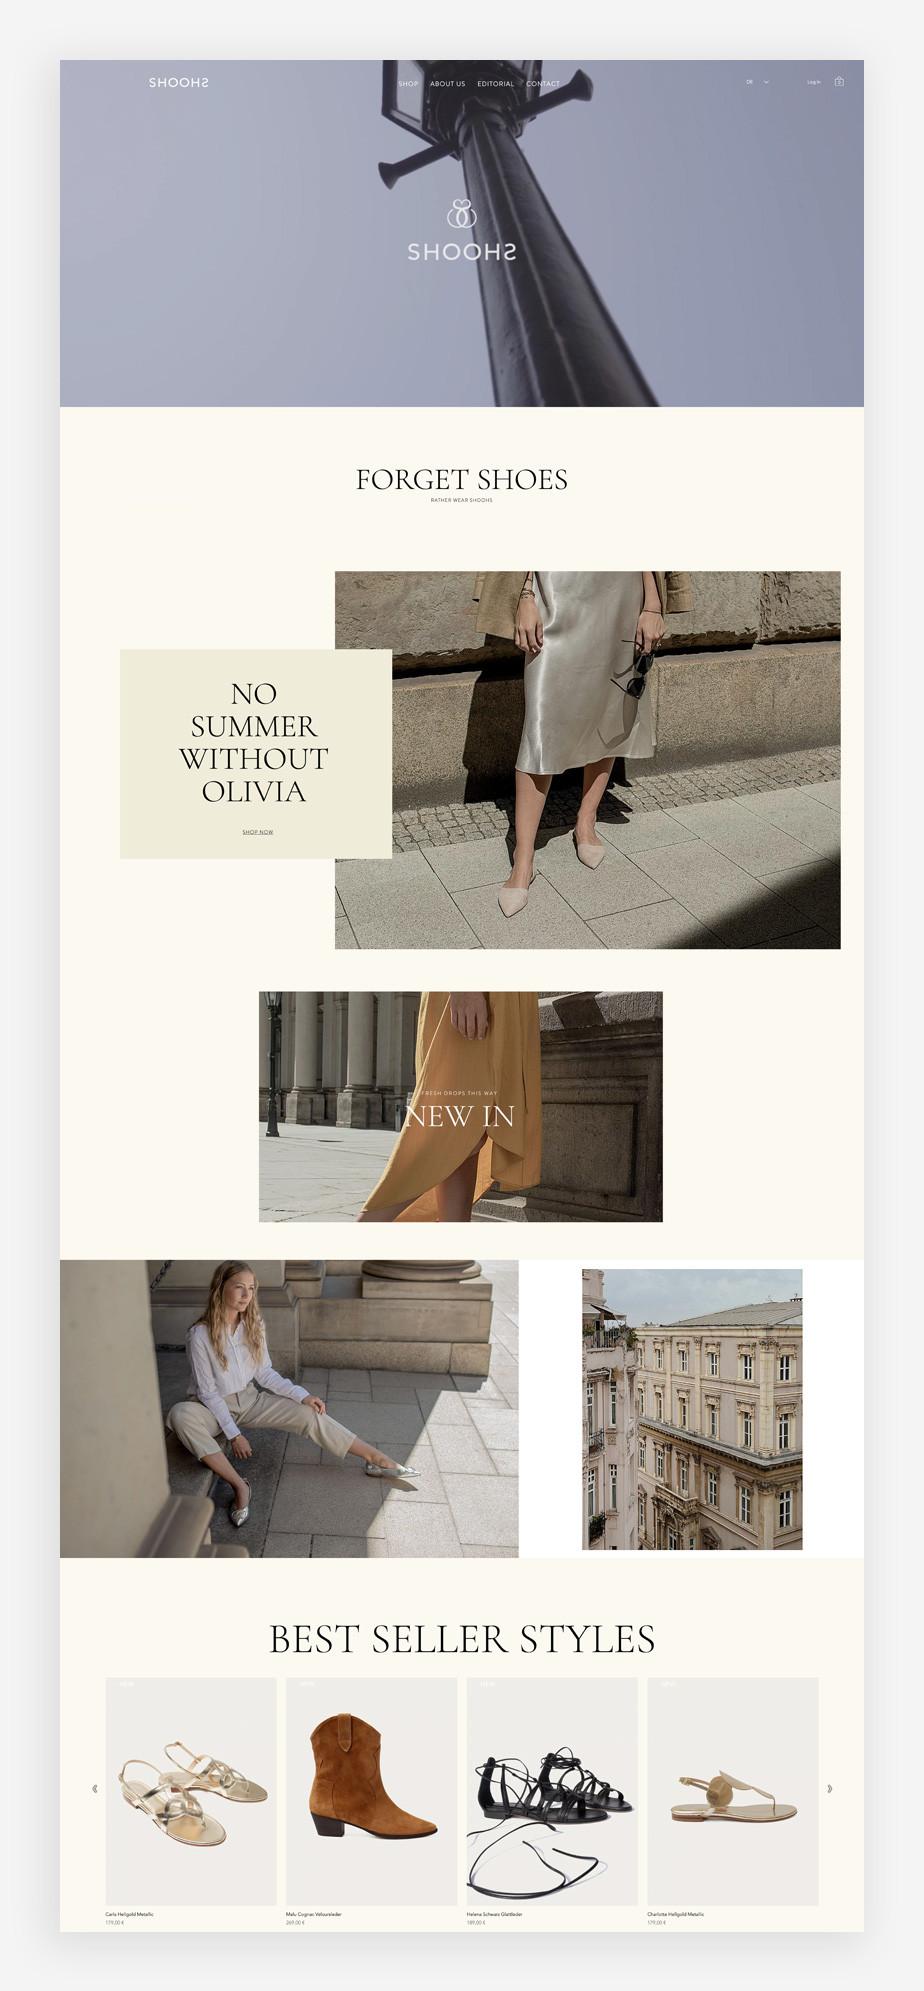 Screenshoot der Website von SHOOHS